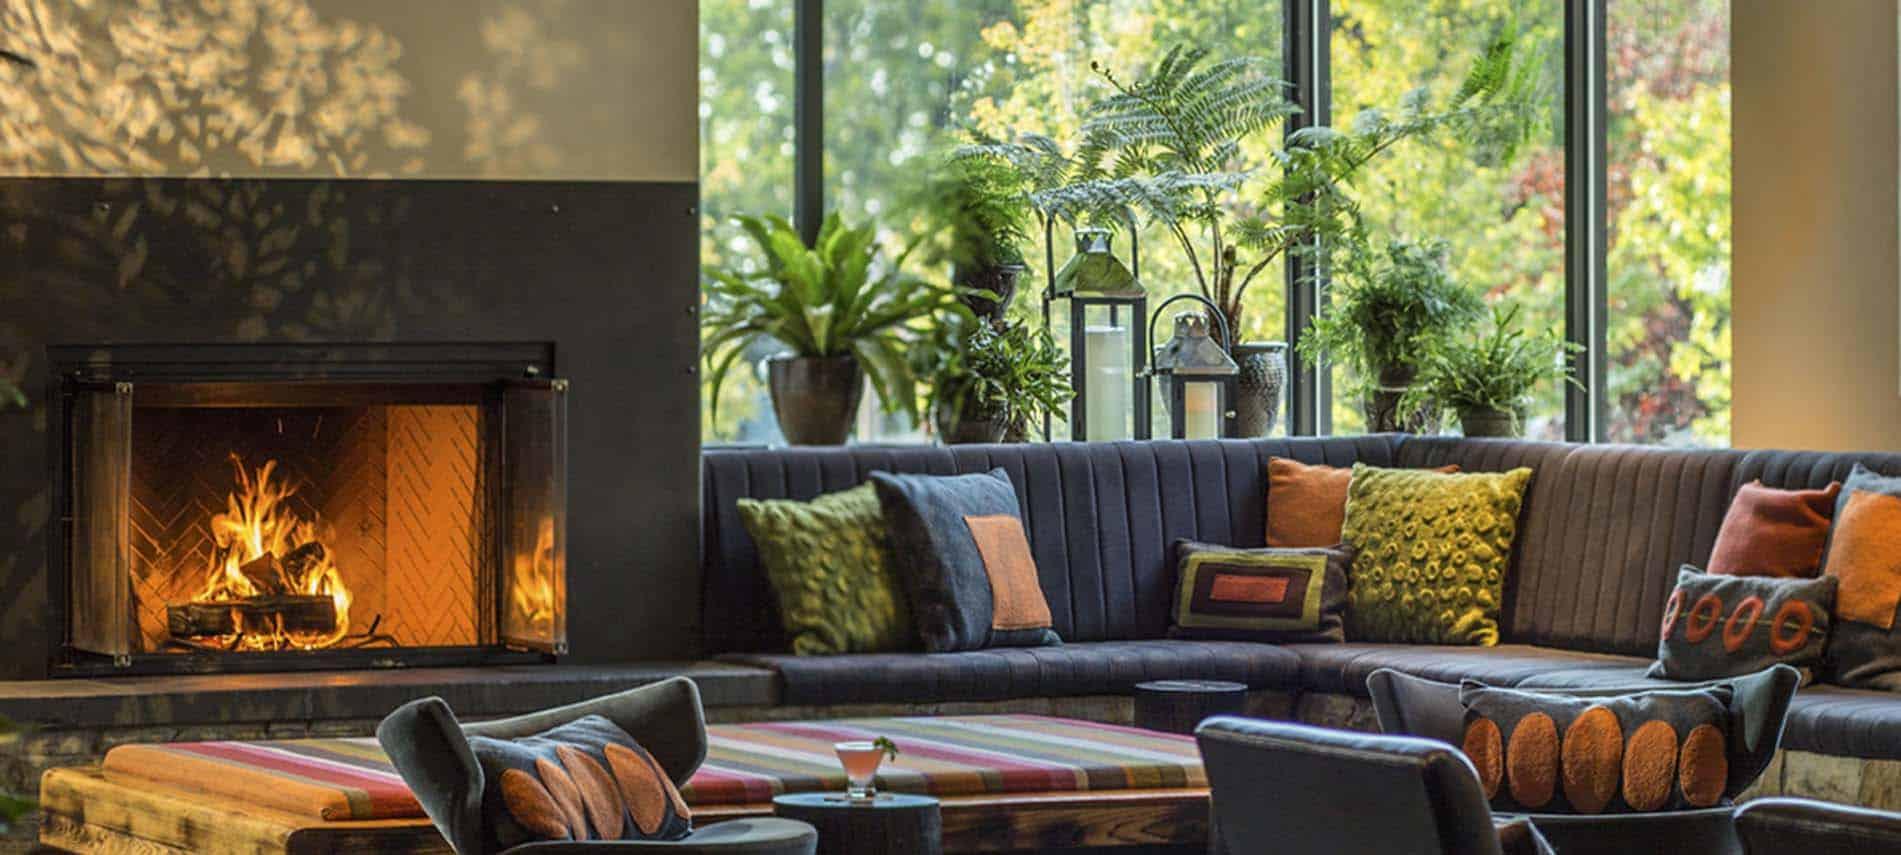 hotel vermont lobby modern throw pillows burning fireplace